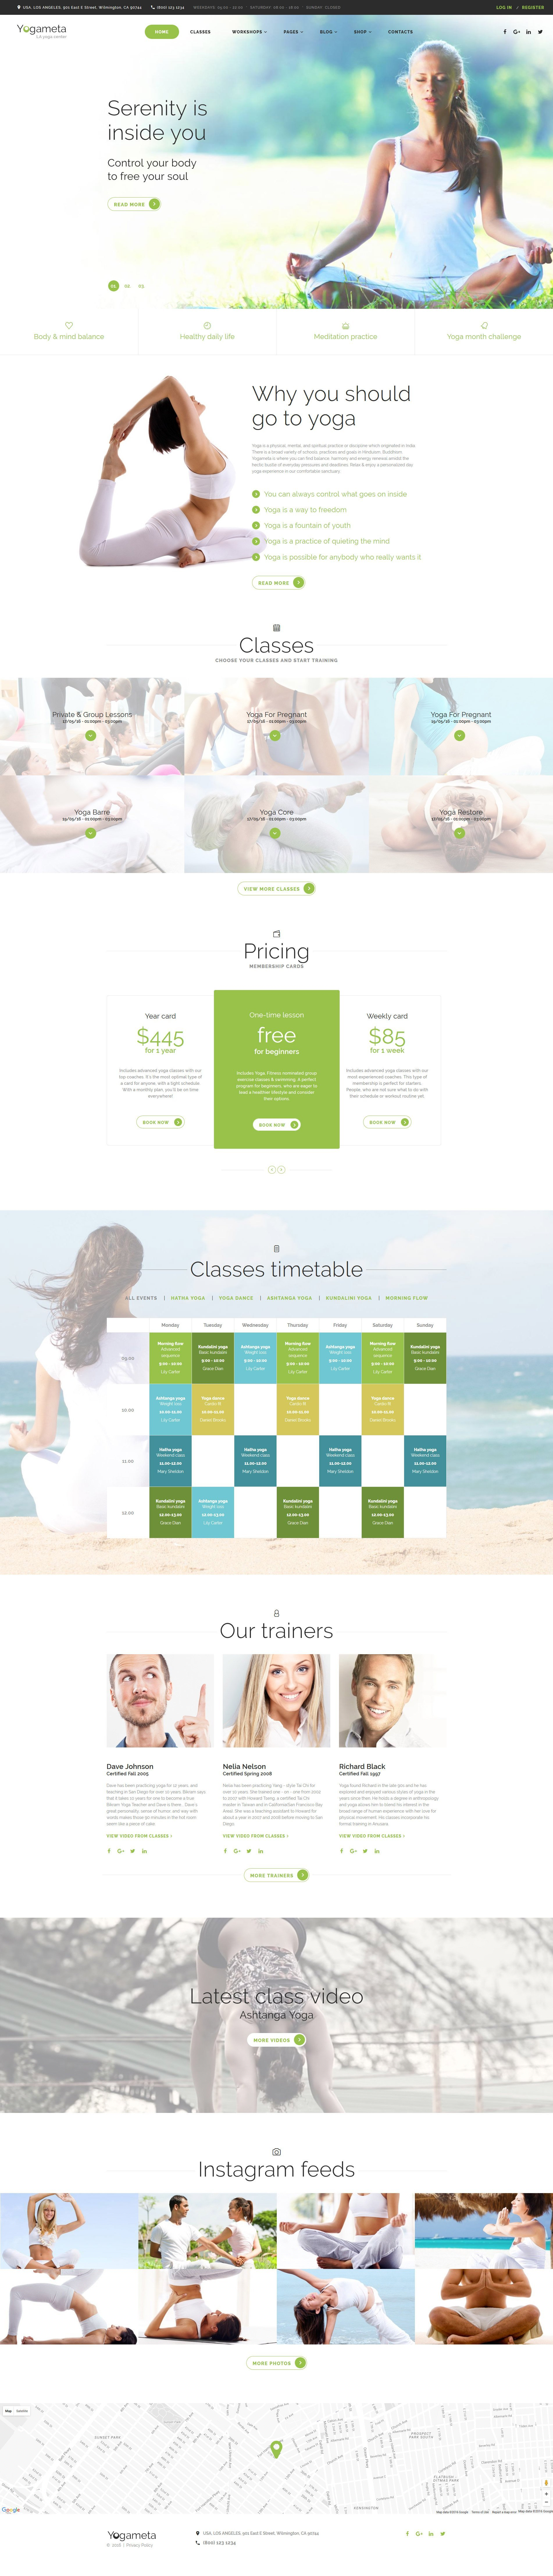 Yogameta Website Template